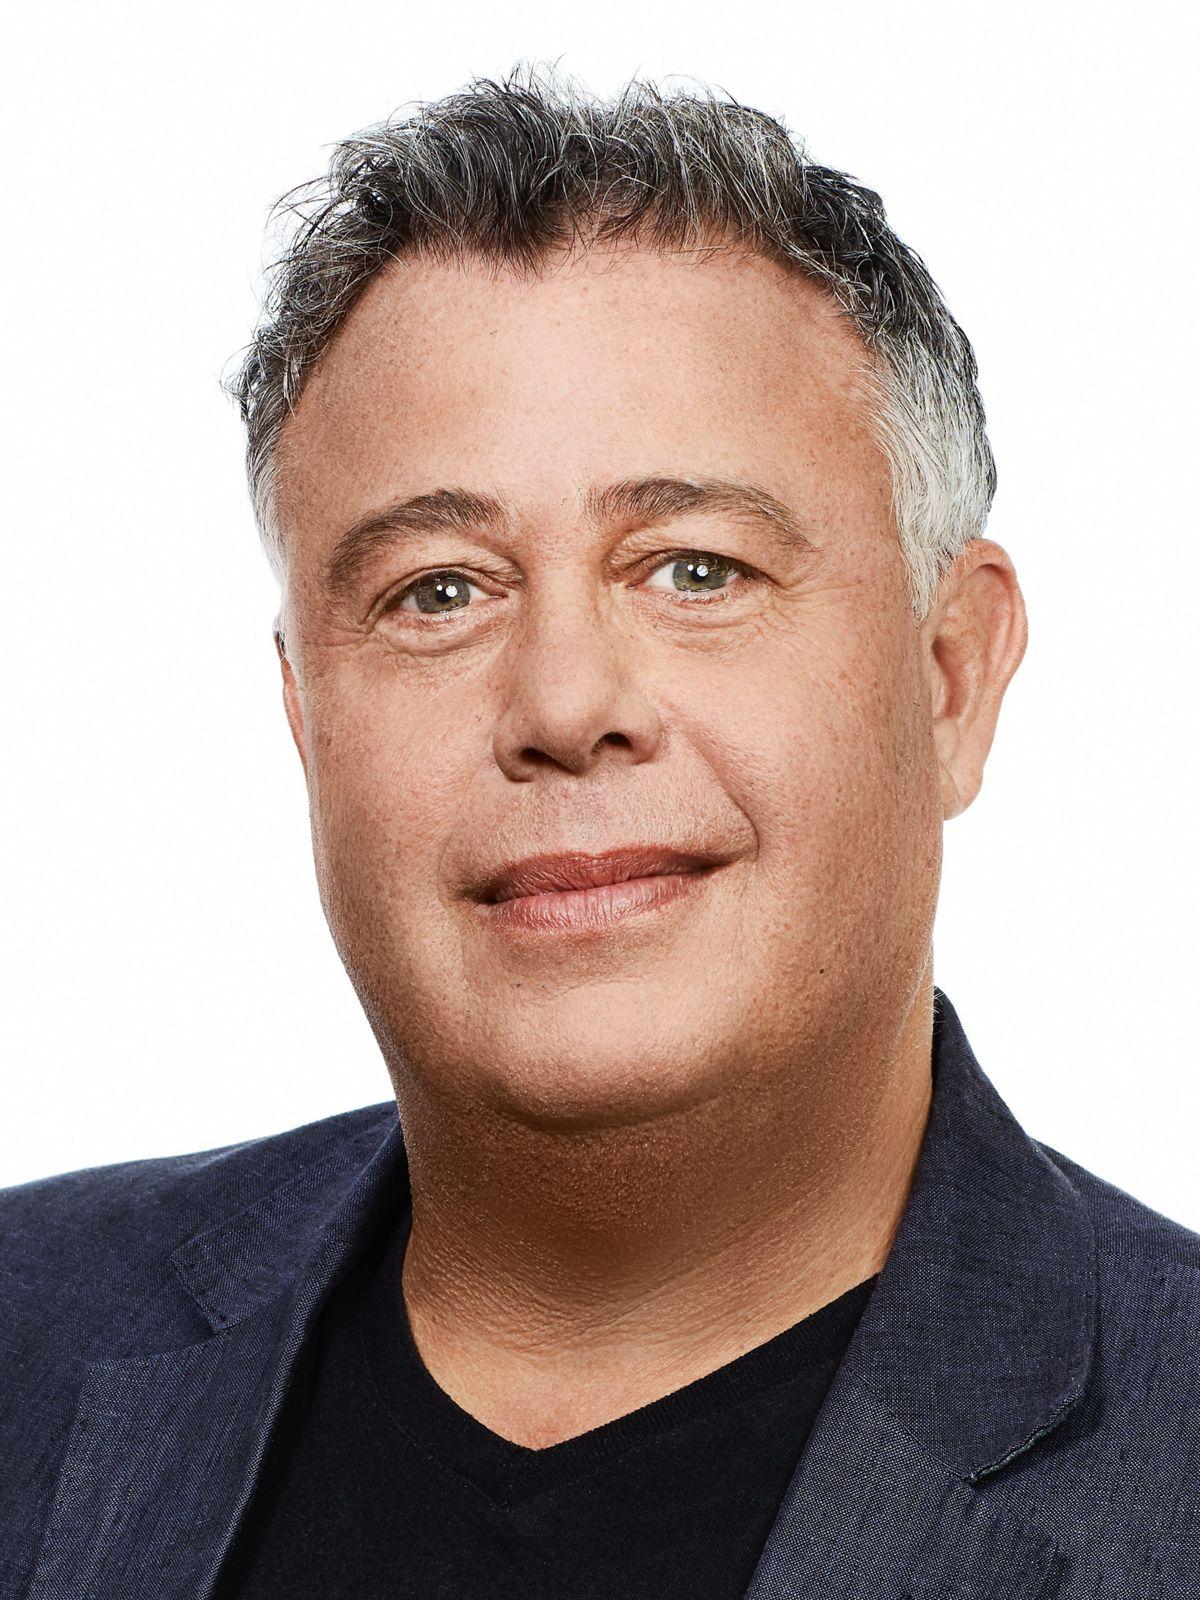 Dion J. Weisler Joins Intel's Board of Directors, Intel